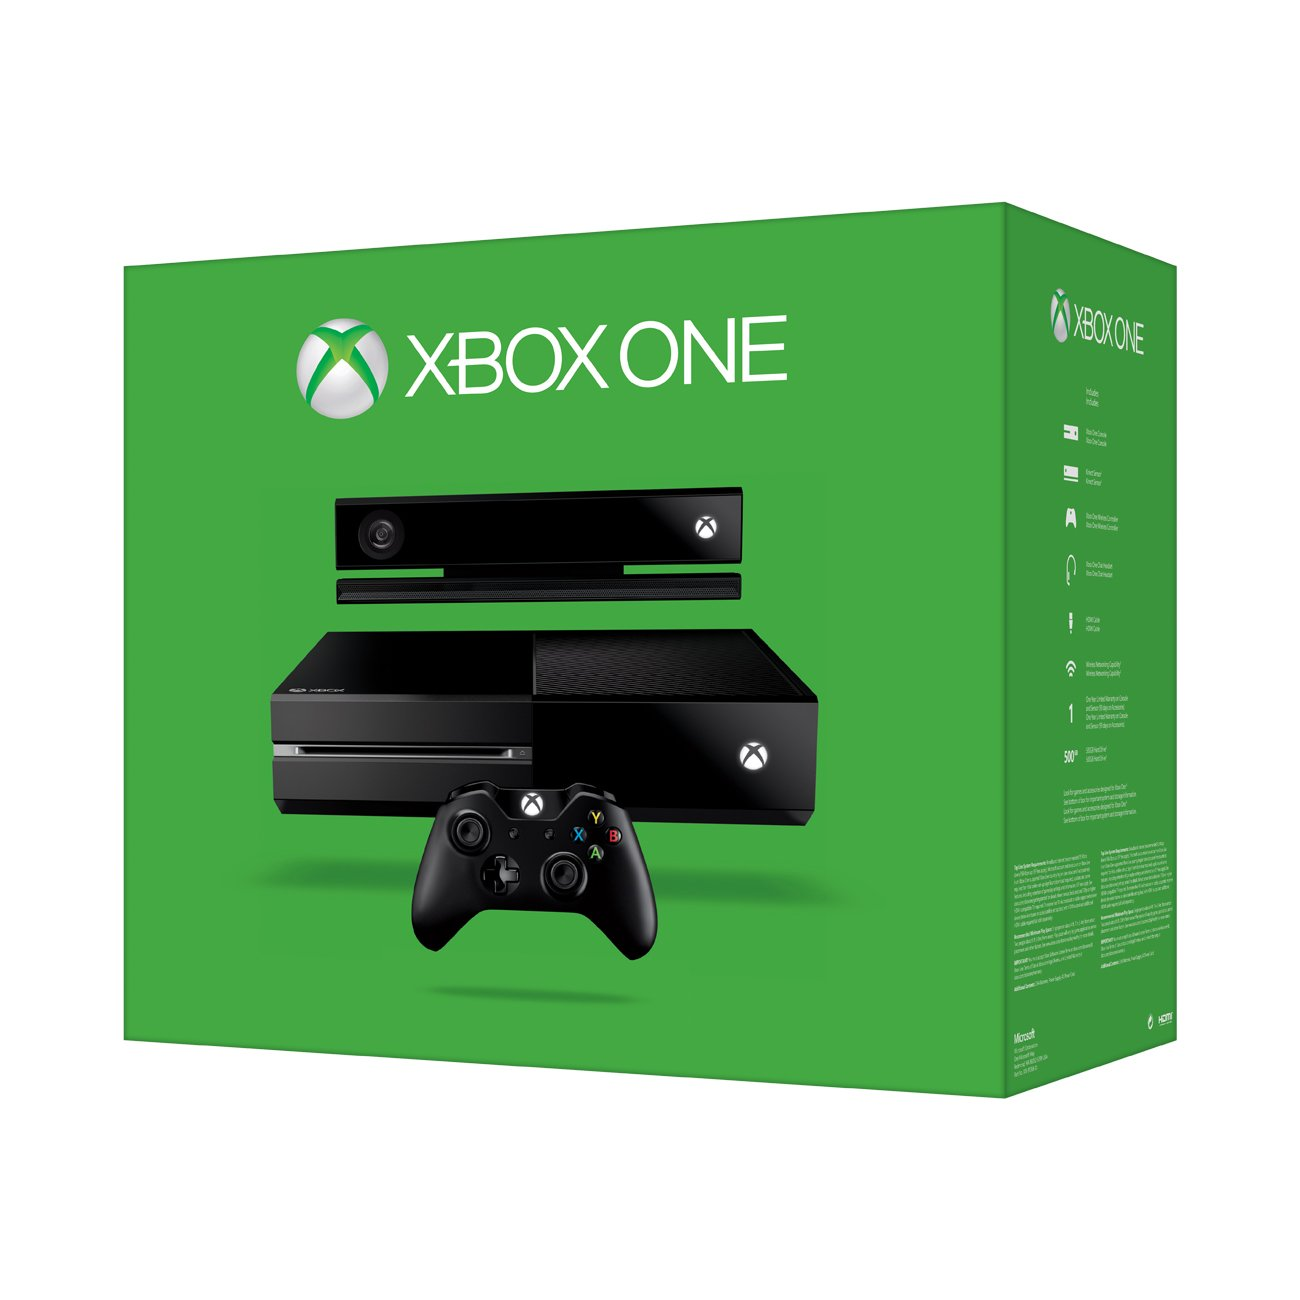 Microsoft Xbox One 500GB Wifi Negro - Videoconsolas (Xbox One, Negro, 8192 MB, DDR3, AMD Radeon, Unidad de disco duro): Amazon.es: Videojuegos